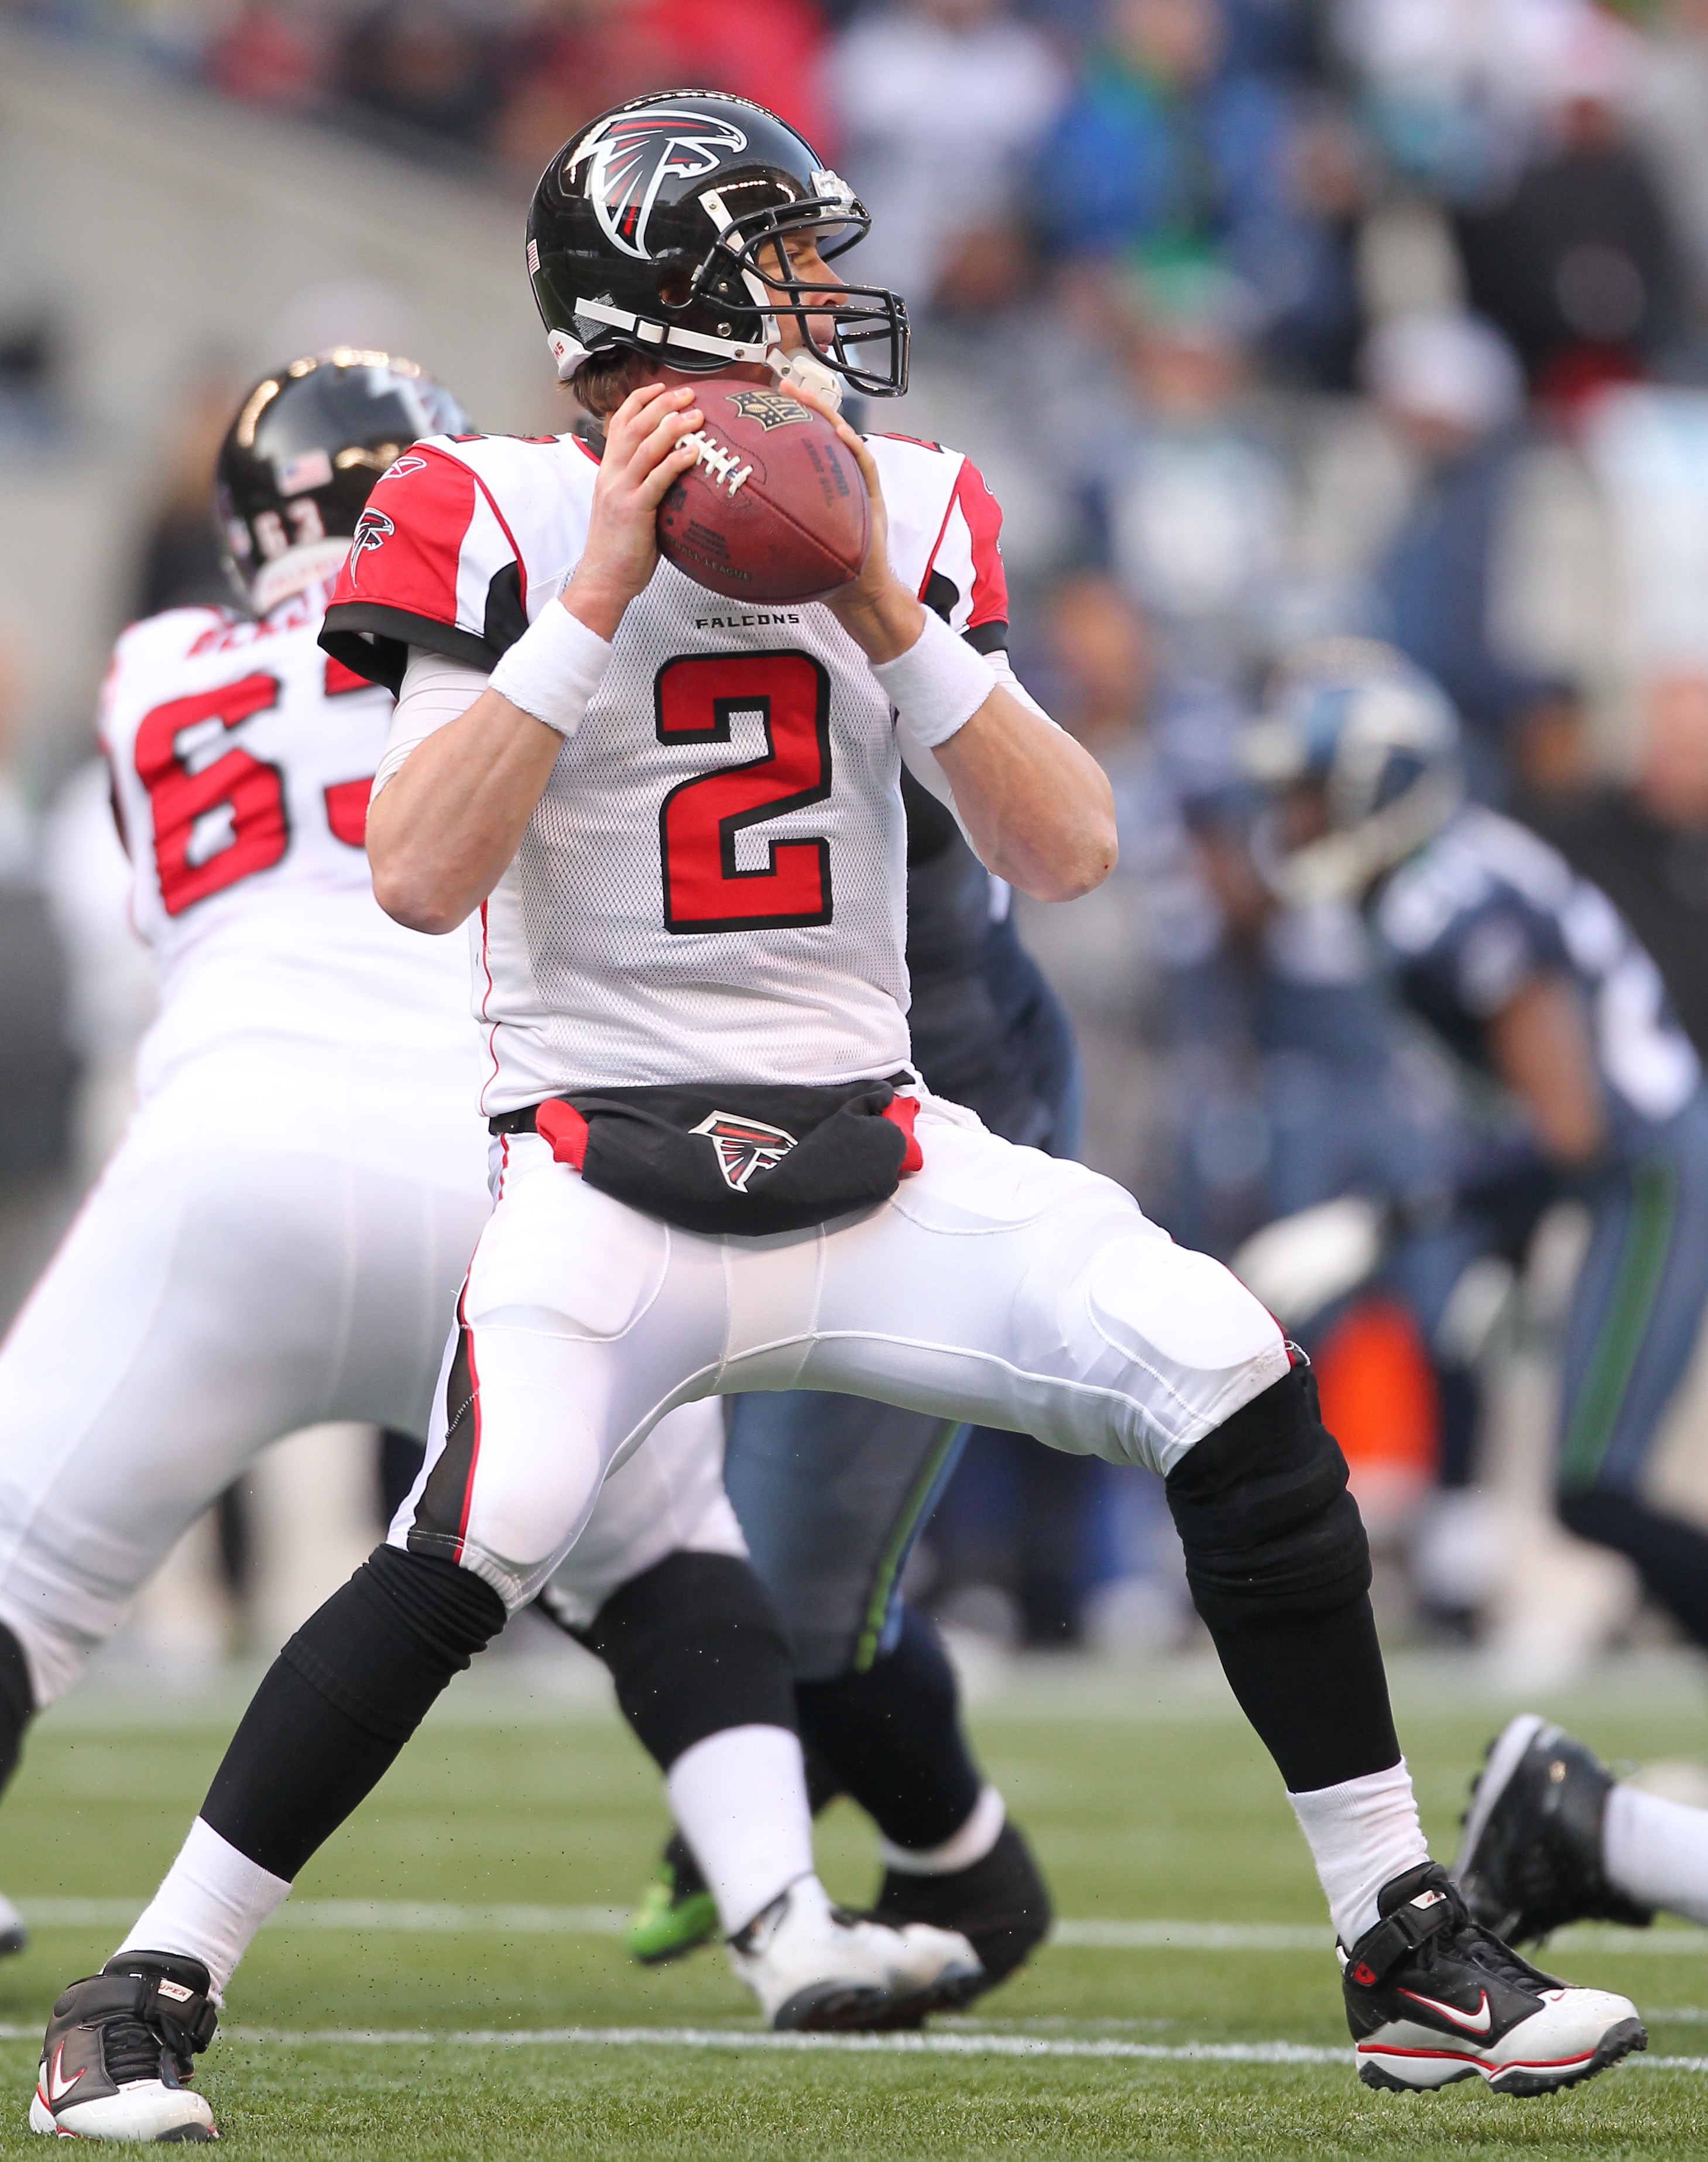 Matt Ryan has been the key that has driven this Atlanta Falcons methodical offense